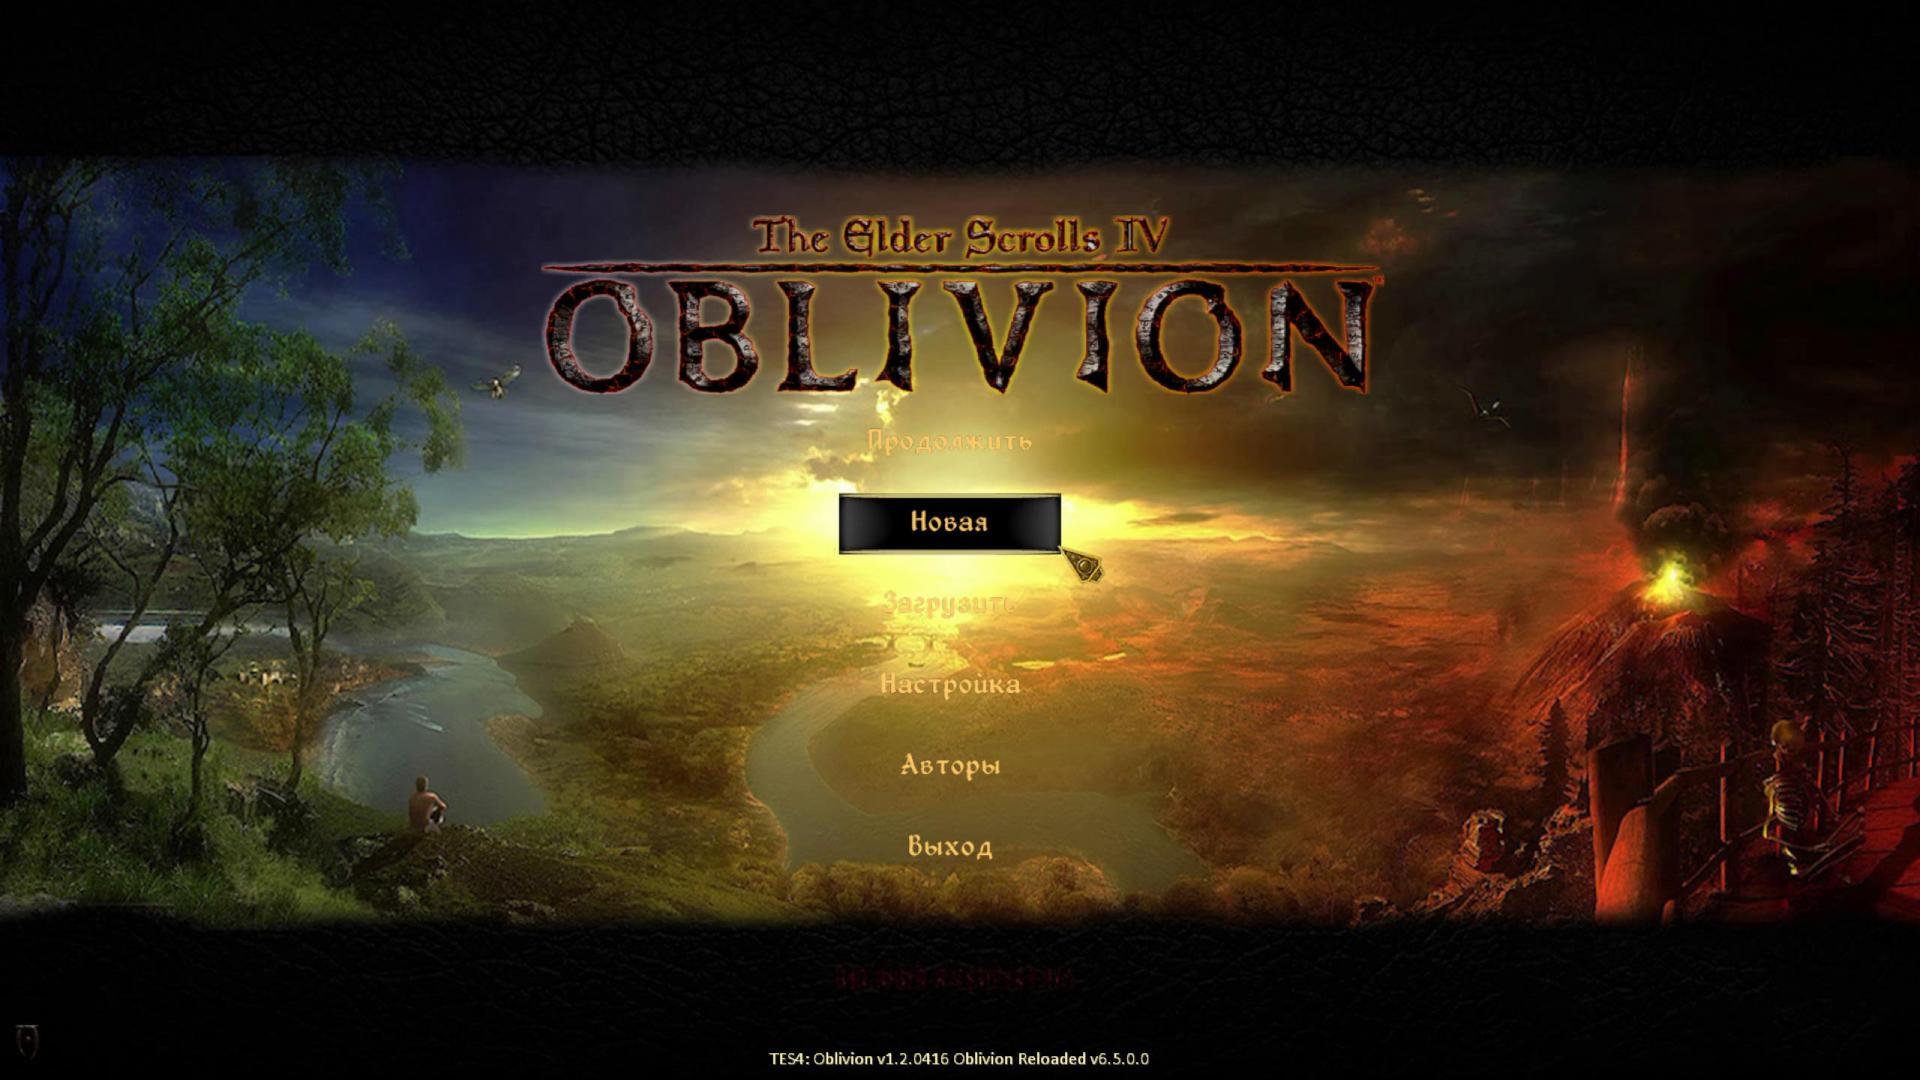 оа - 51983 - Oblivion Association - Галерея - TESALL RU